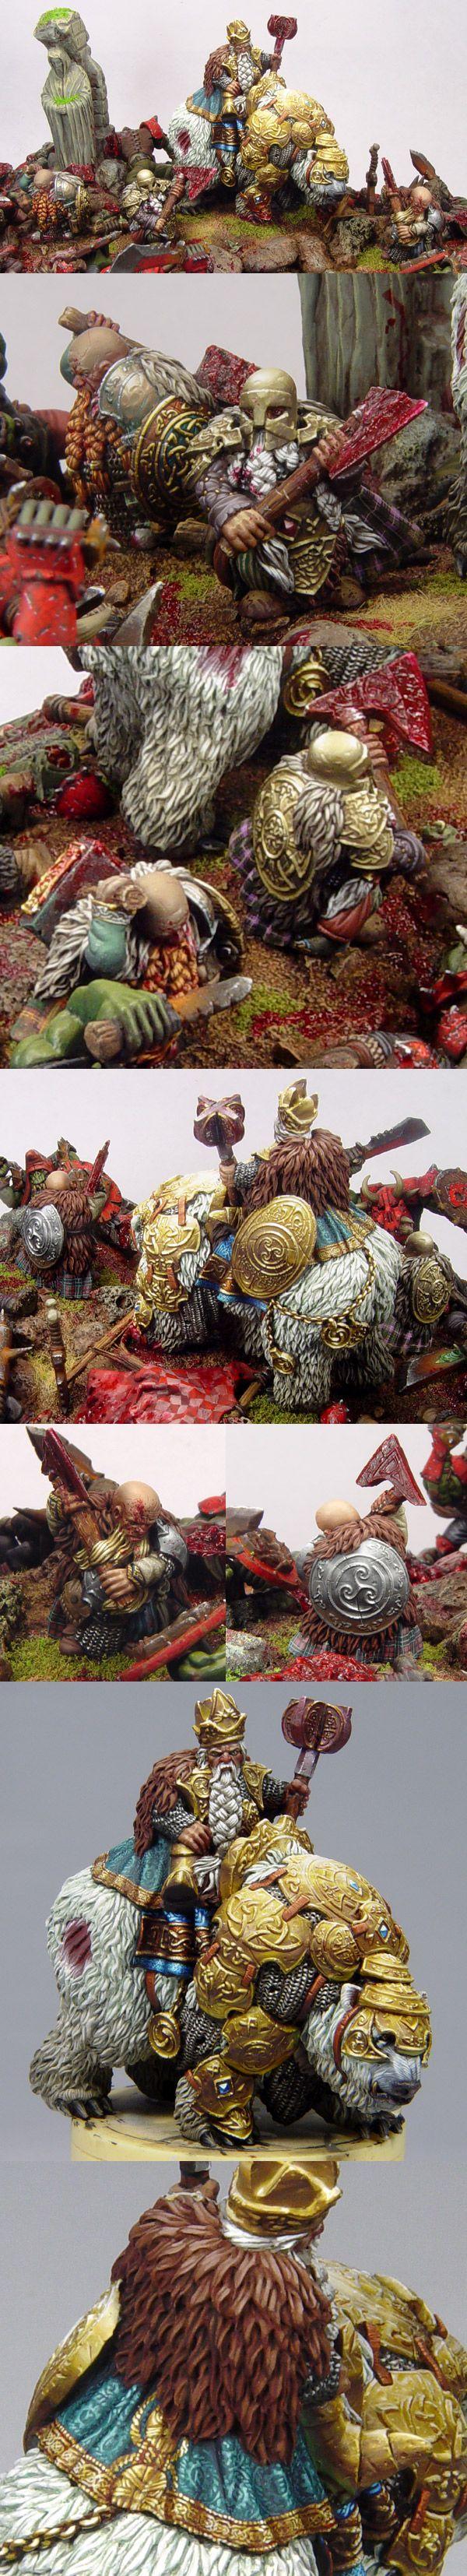 Scibor`s dwarfes and dwarf king